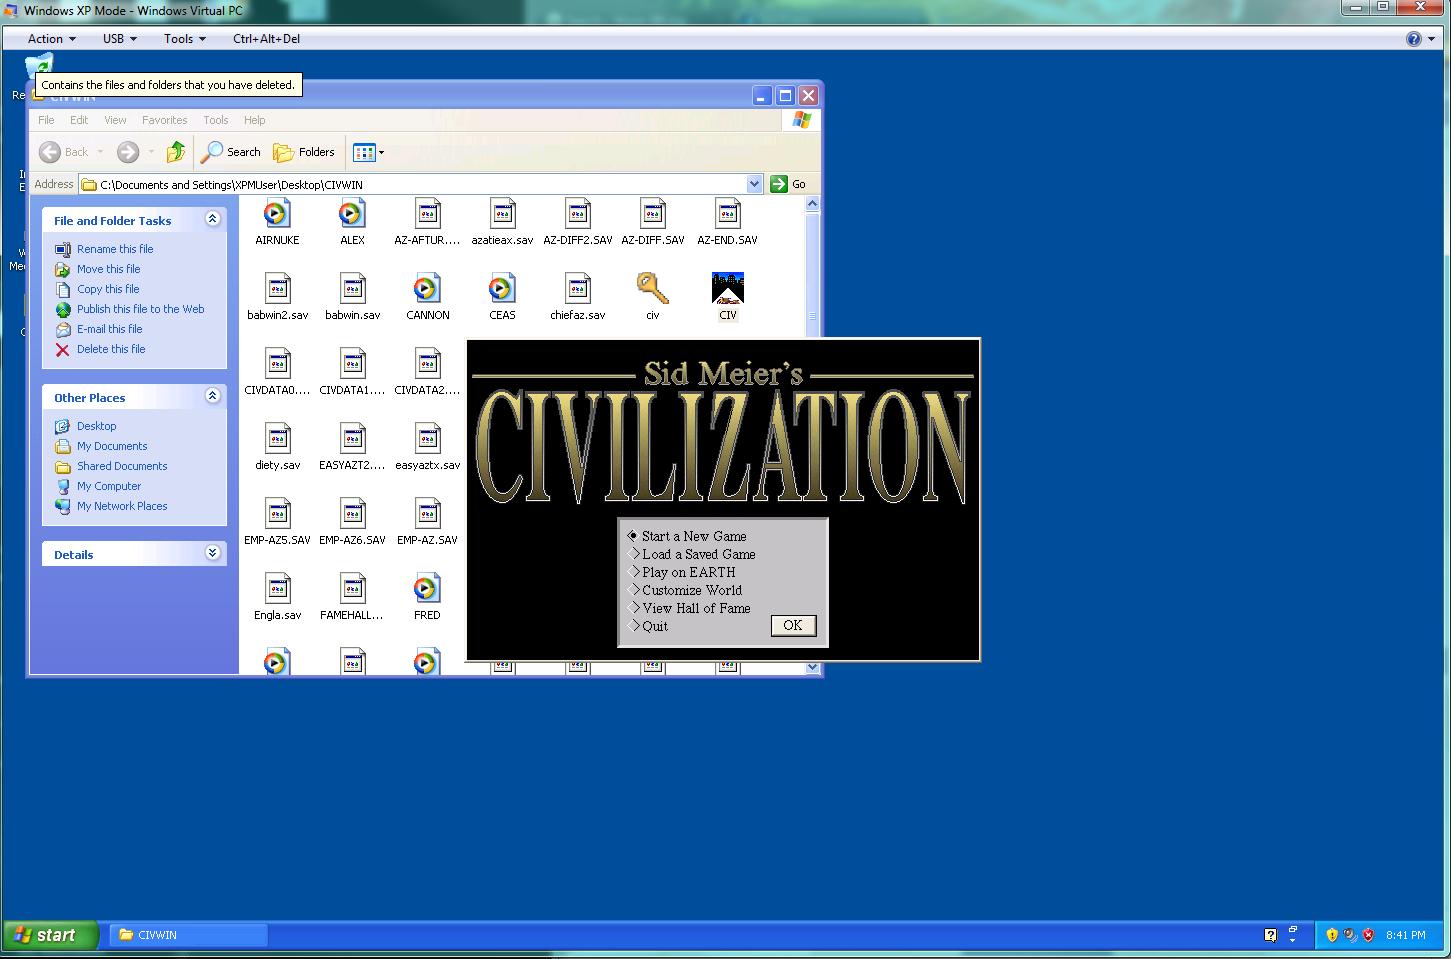 download xp mode virtual pc for windows 7